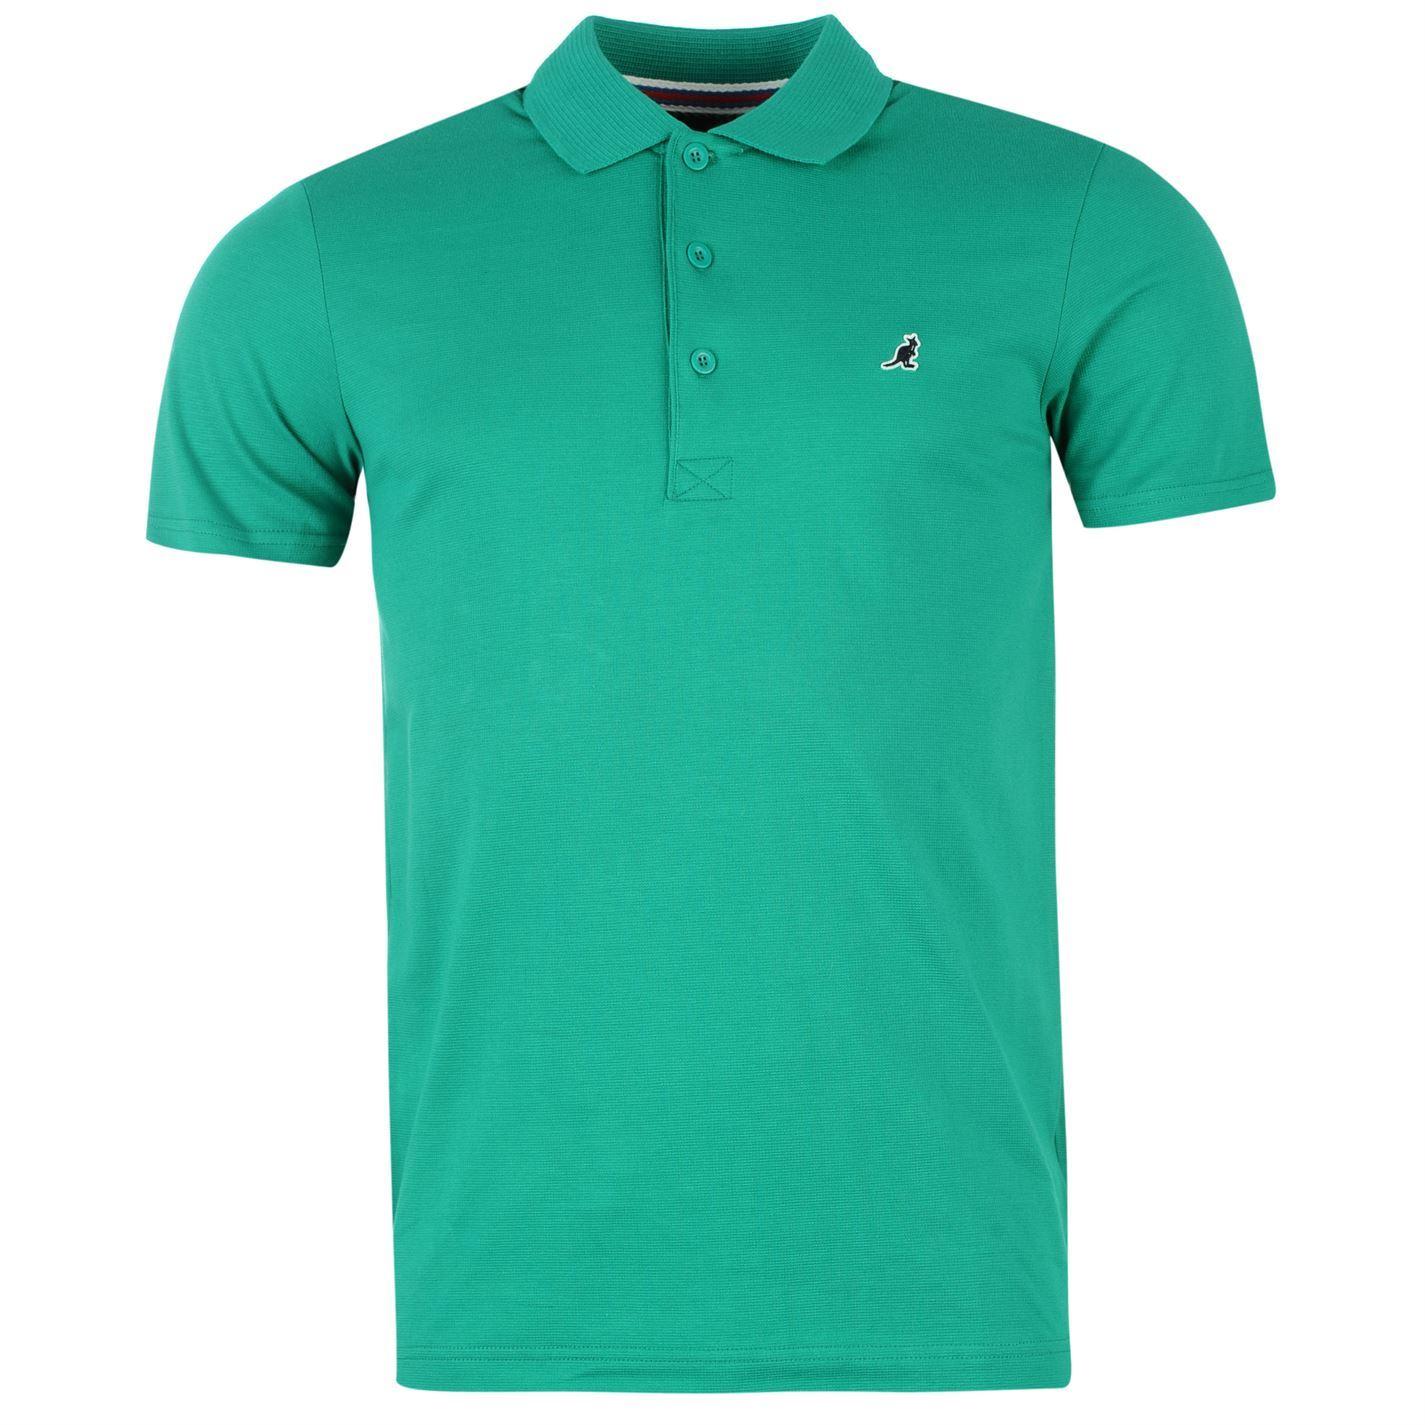 Kangol Mens Slim Fit Polo Neck T Shirt Ribbed Collar Short